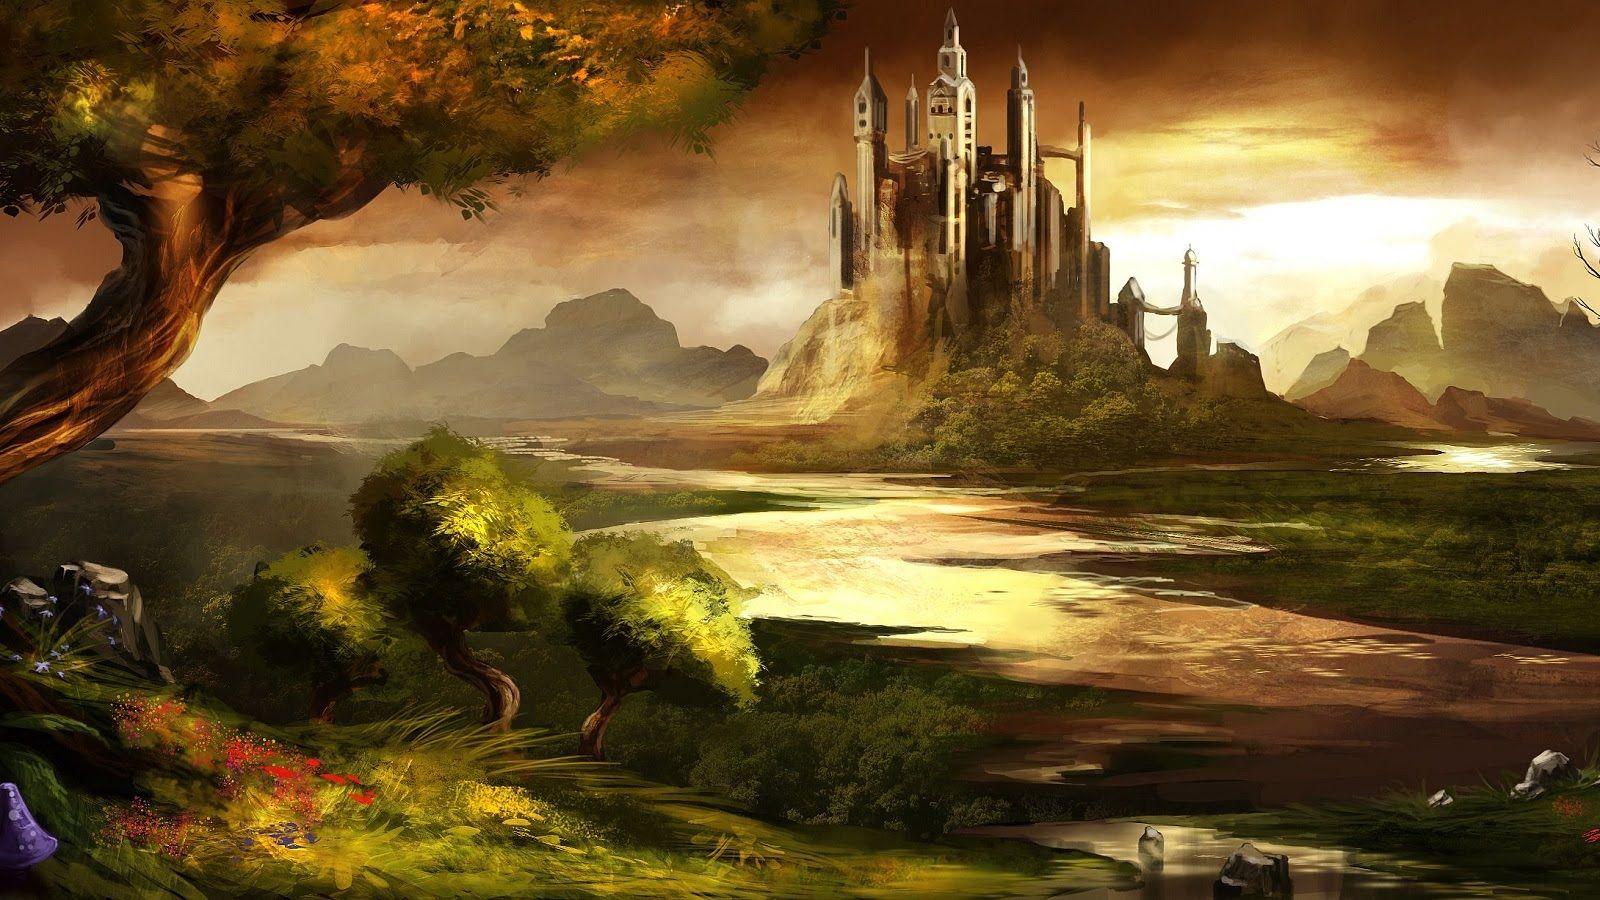 1 Hour Of Medieval Instrumental Music Medieval Camelot Medieval Music Fantasy Castle Renaissance Music